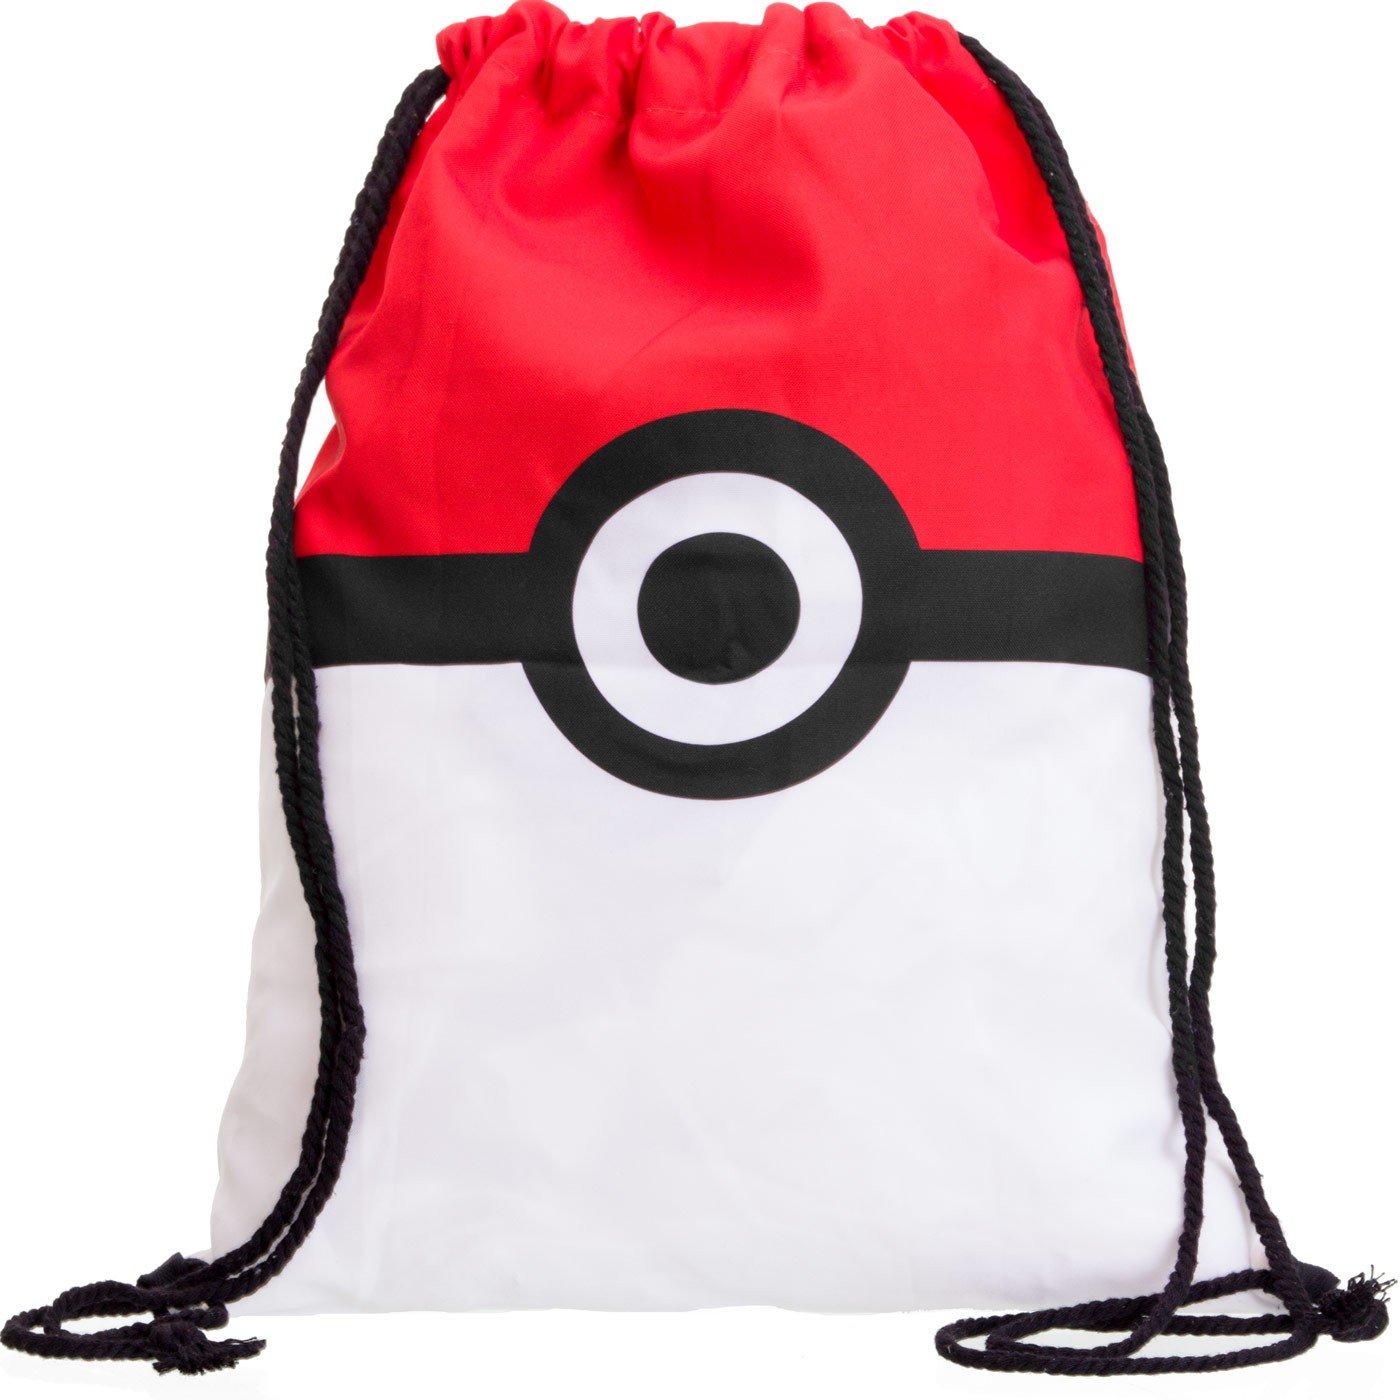 style3 Poké Sac à Dos Cordon gymsac Drawstring Bag